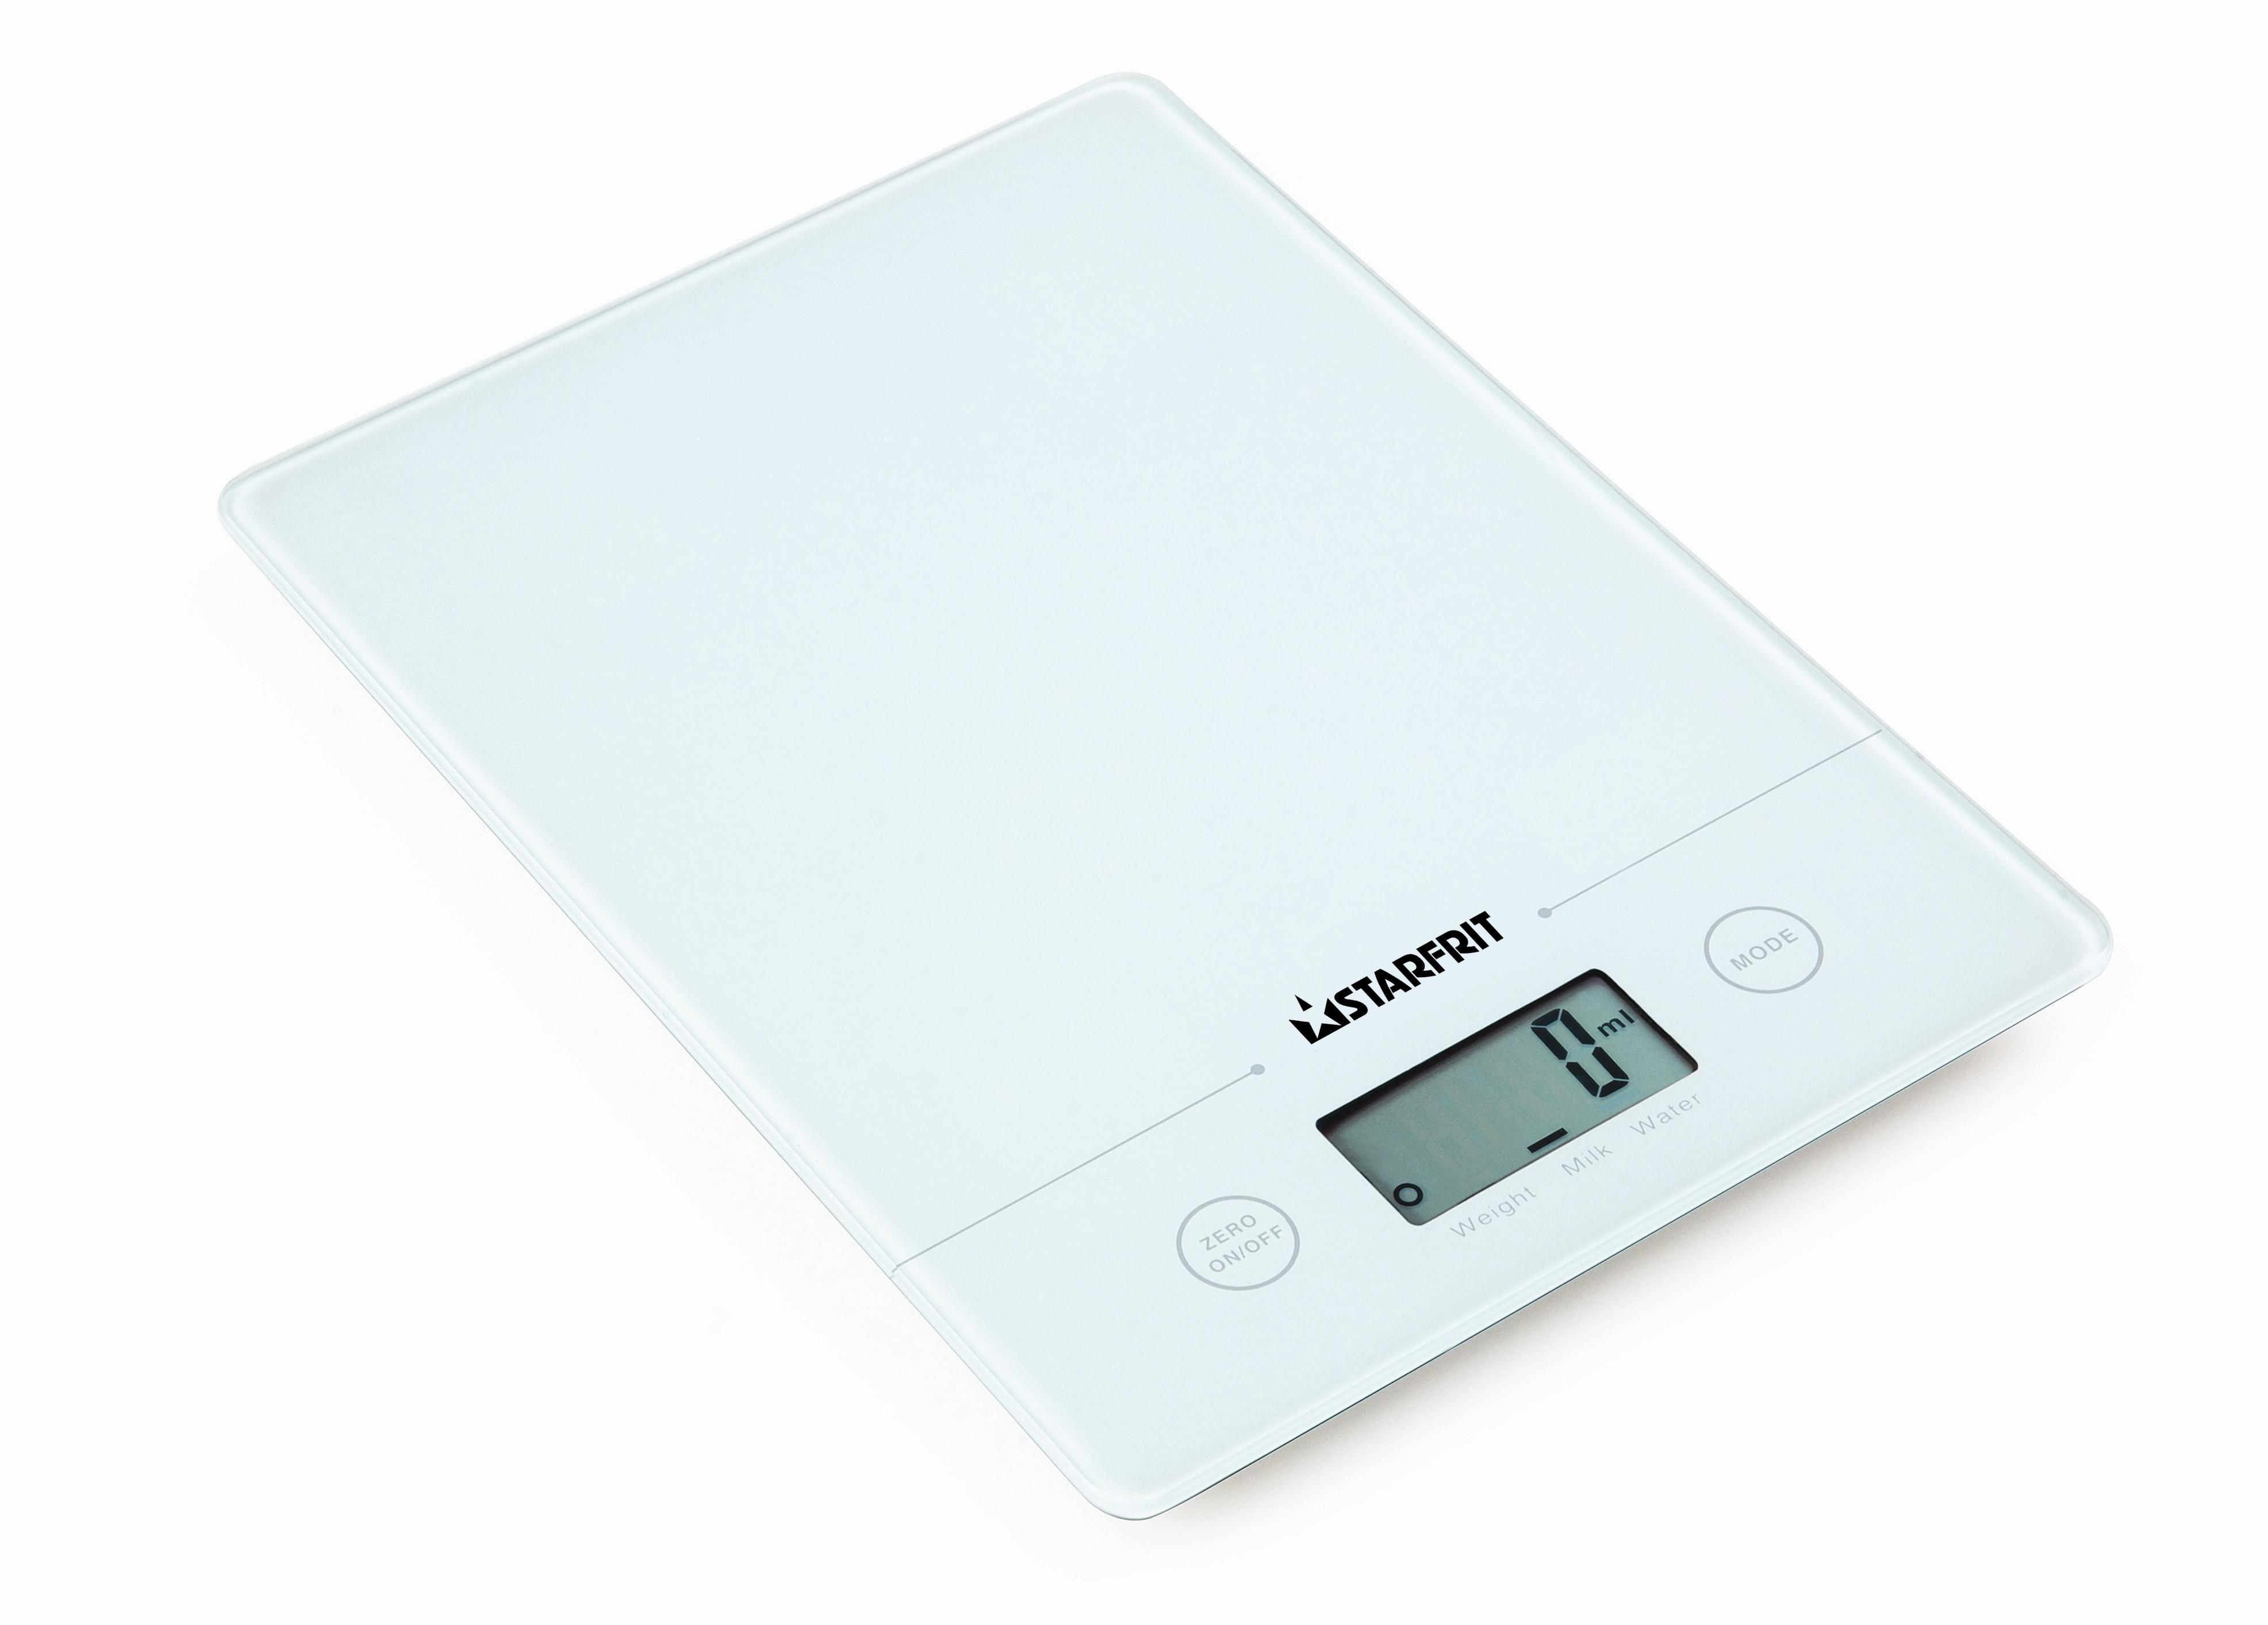 Nice Digital Kitchen Scale. UPC 069858937517 Starfrit 093751 ...